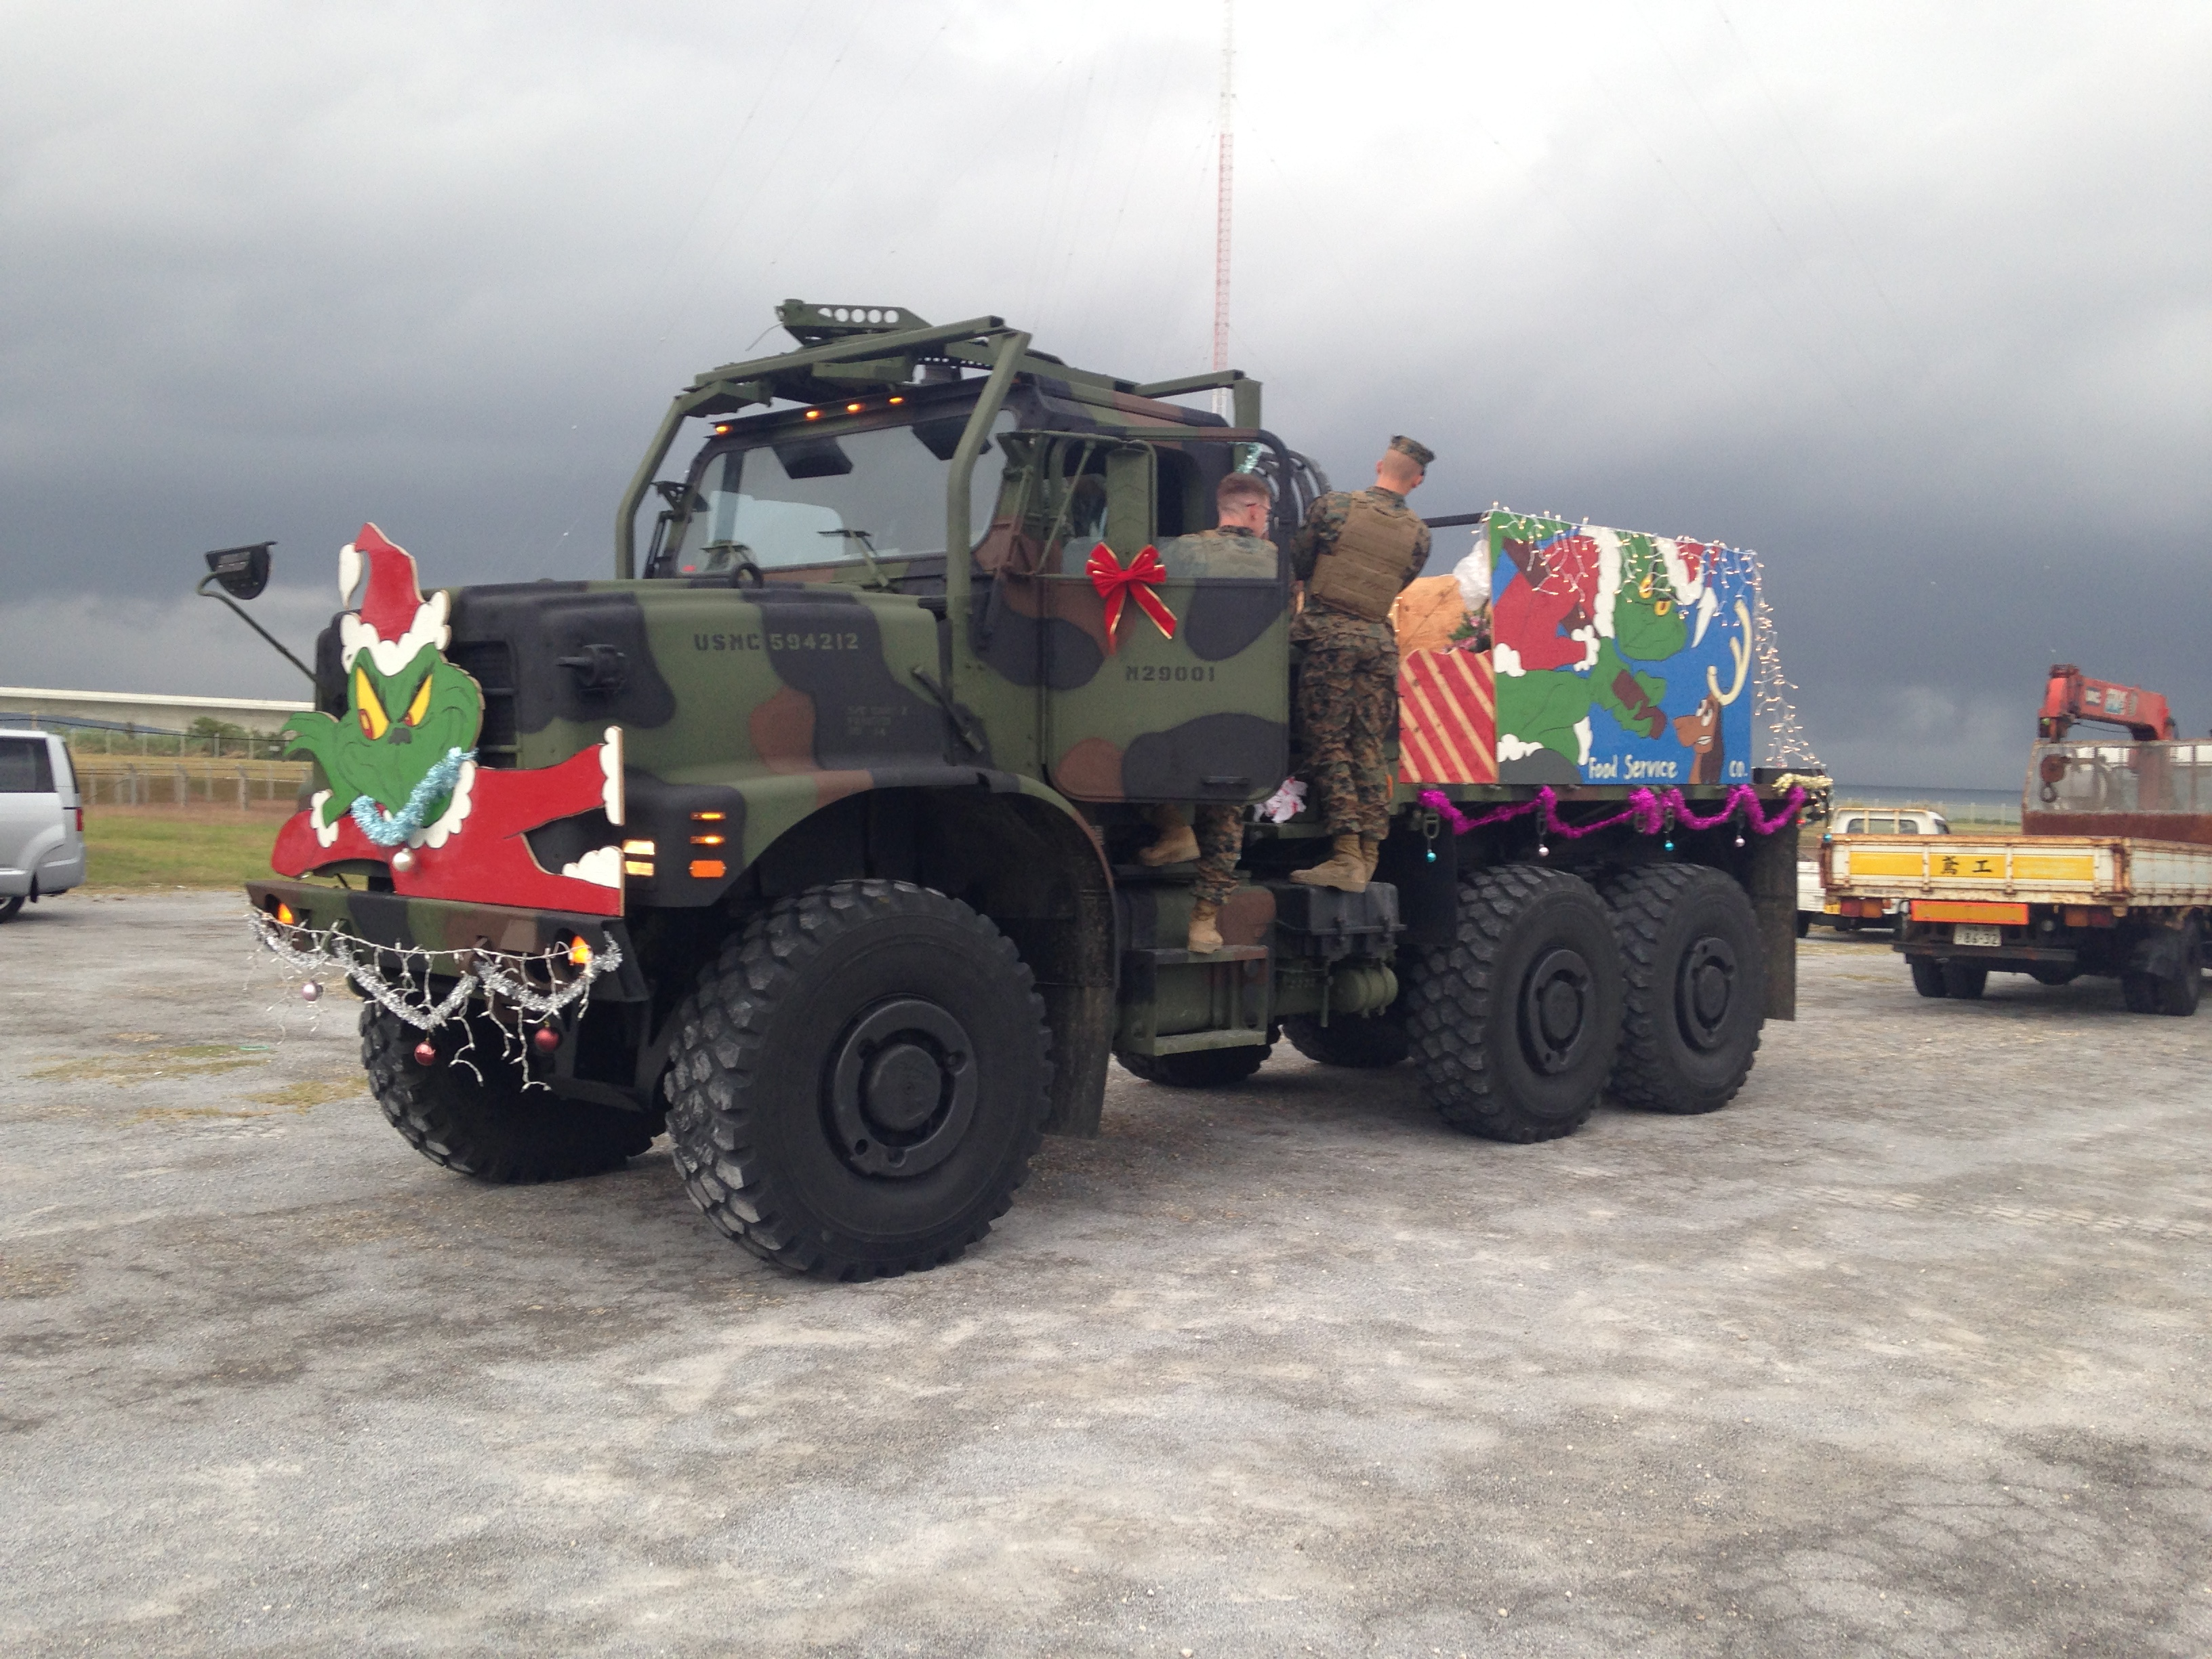 download hi res photo - Christmas Car Parade Decorations